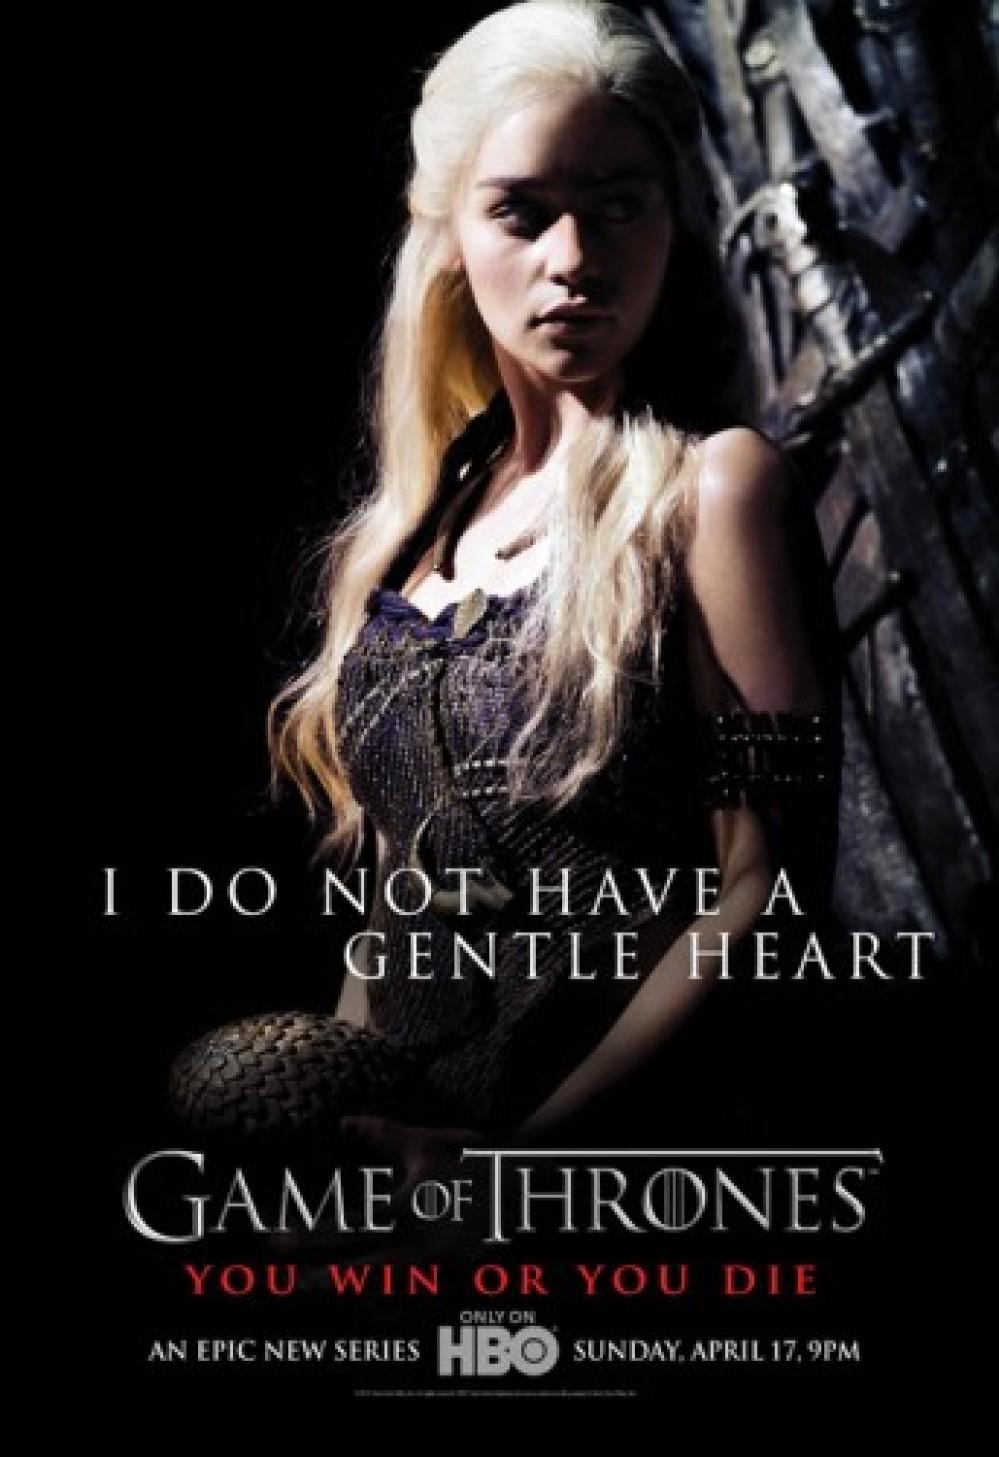 Game of Thrones, το πιο πειρατικό τηλεοπτικό show για το 2012 (;)